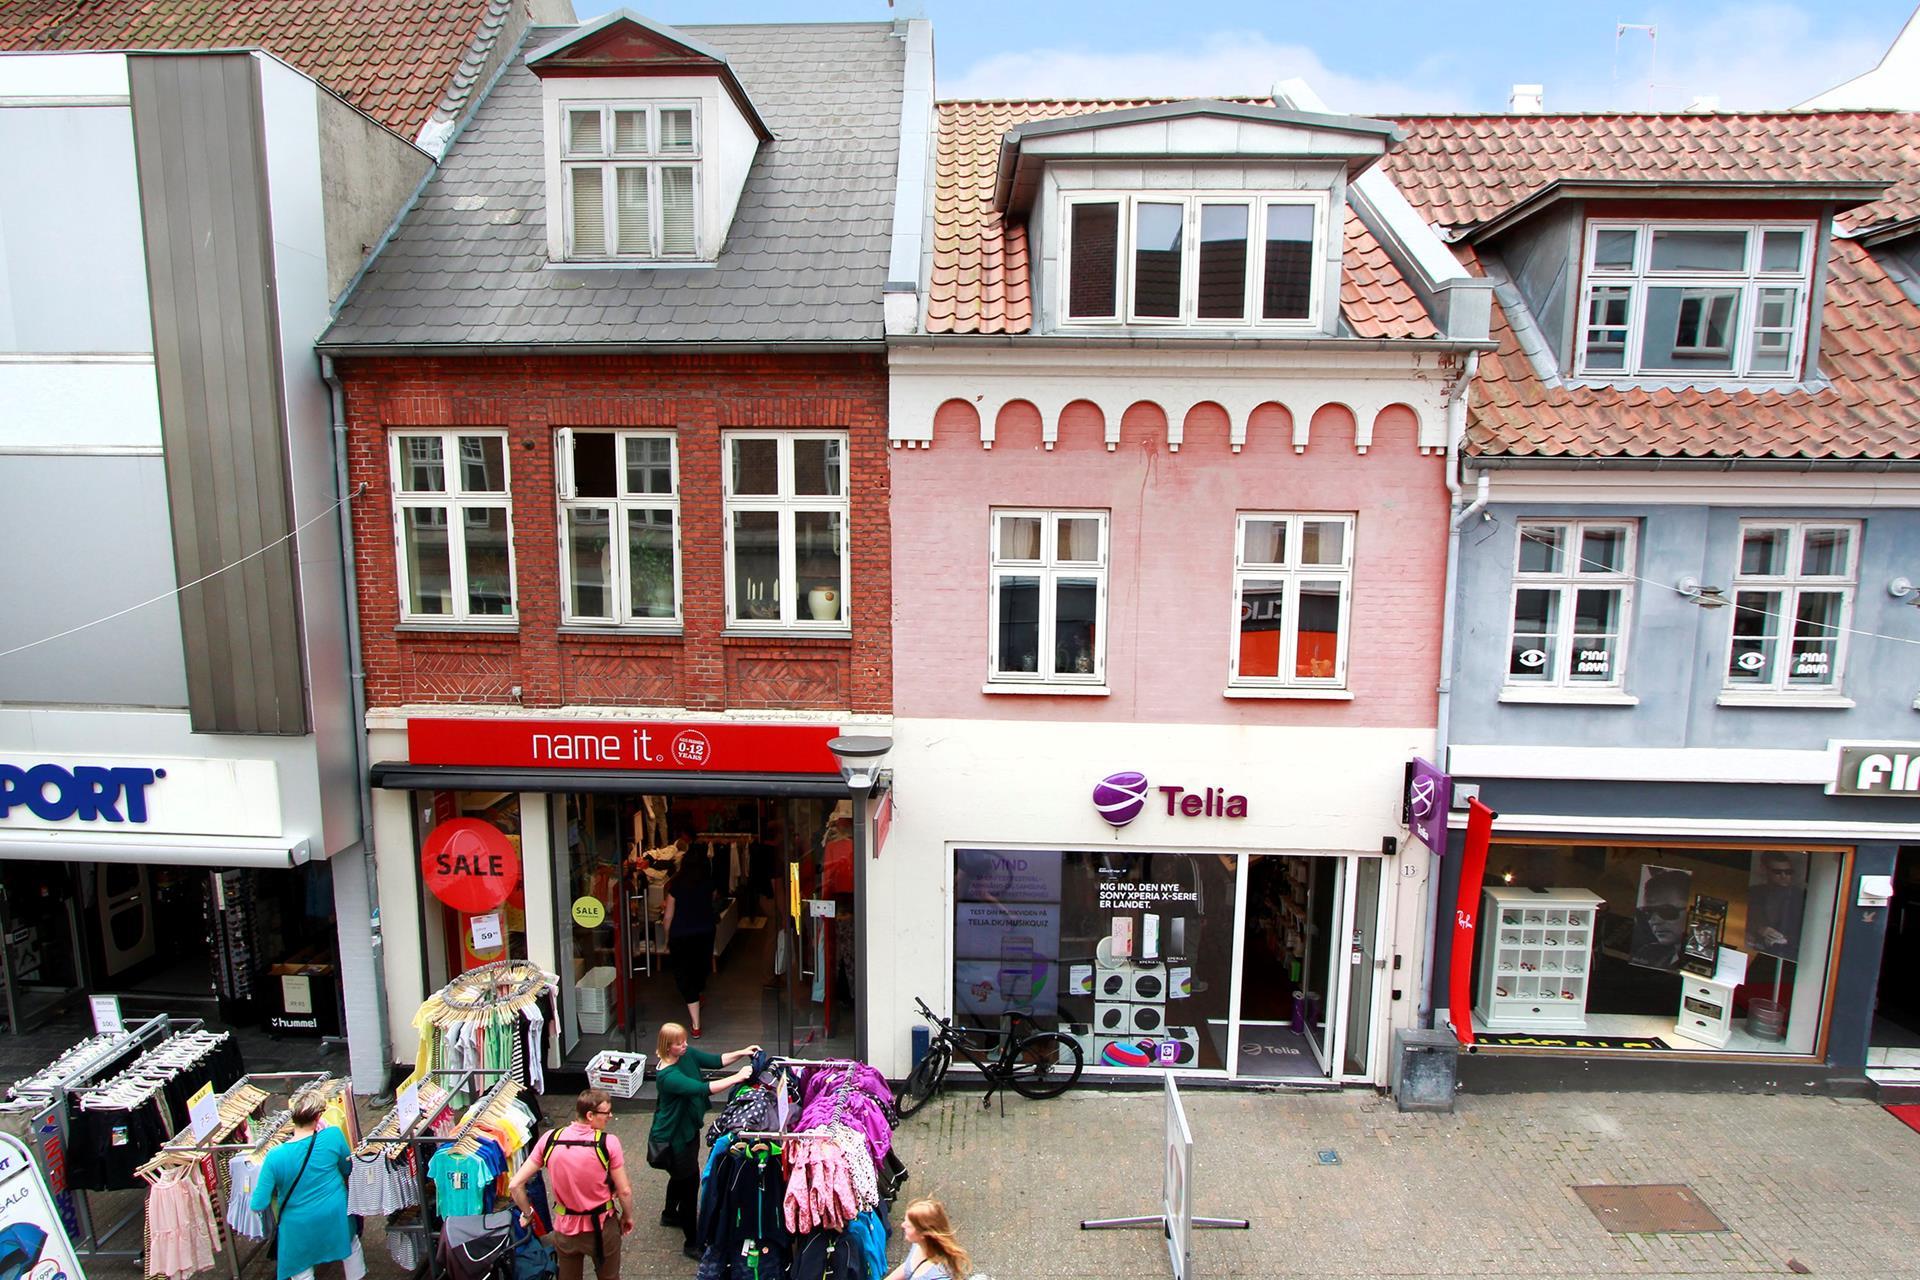 Bolig/erhverv på Gerritsgade i Svendborg - Andet